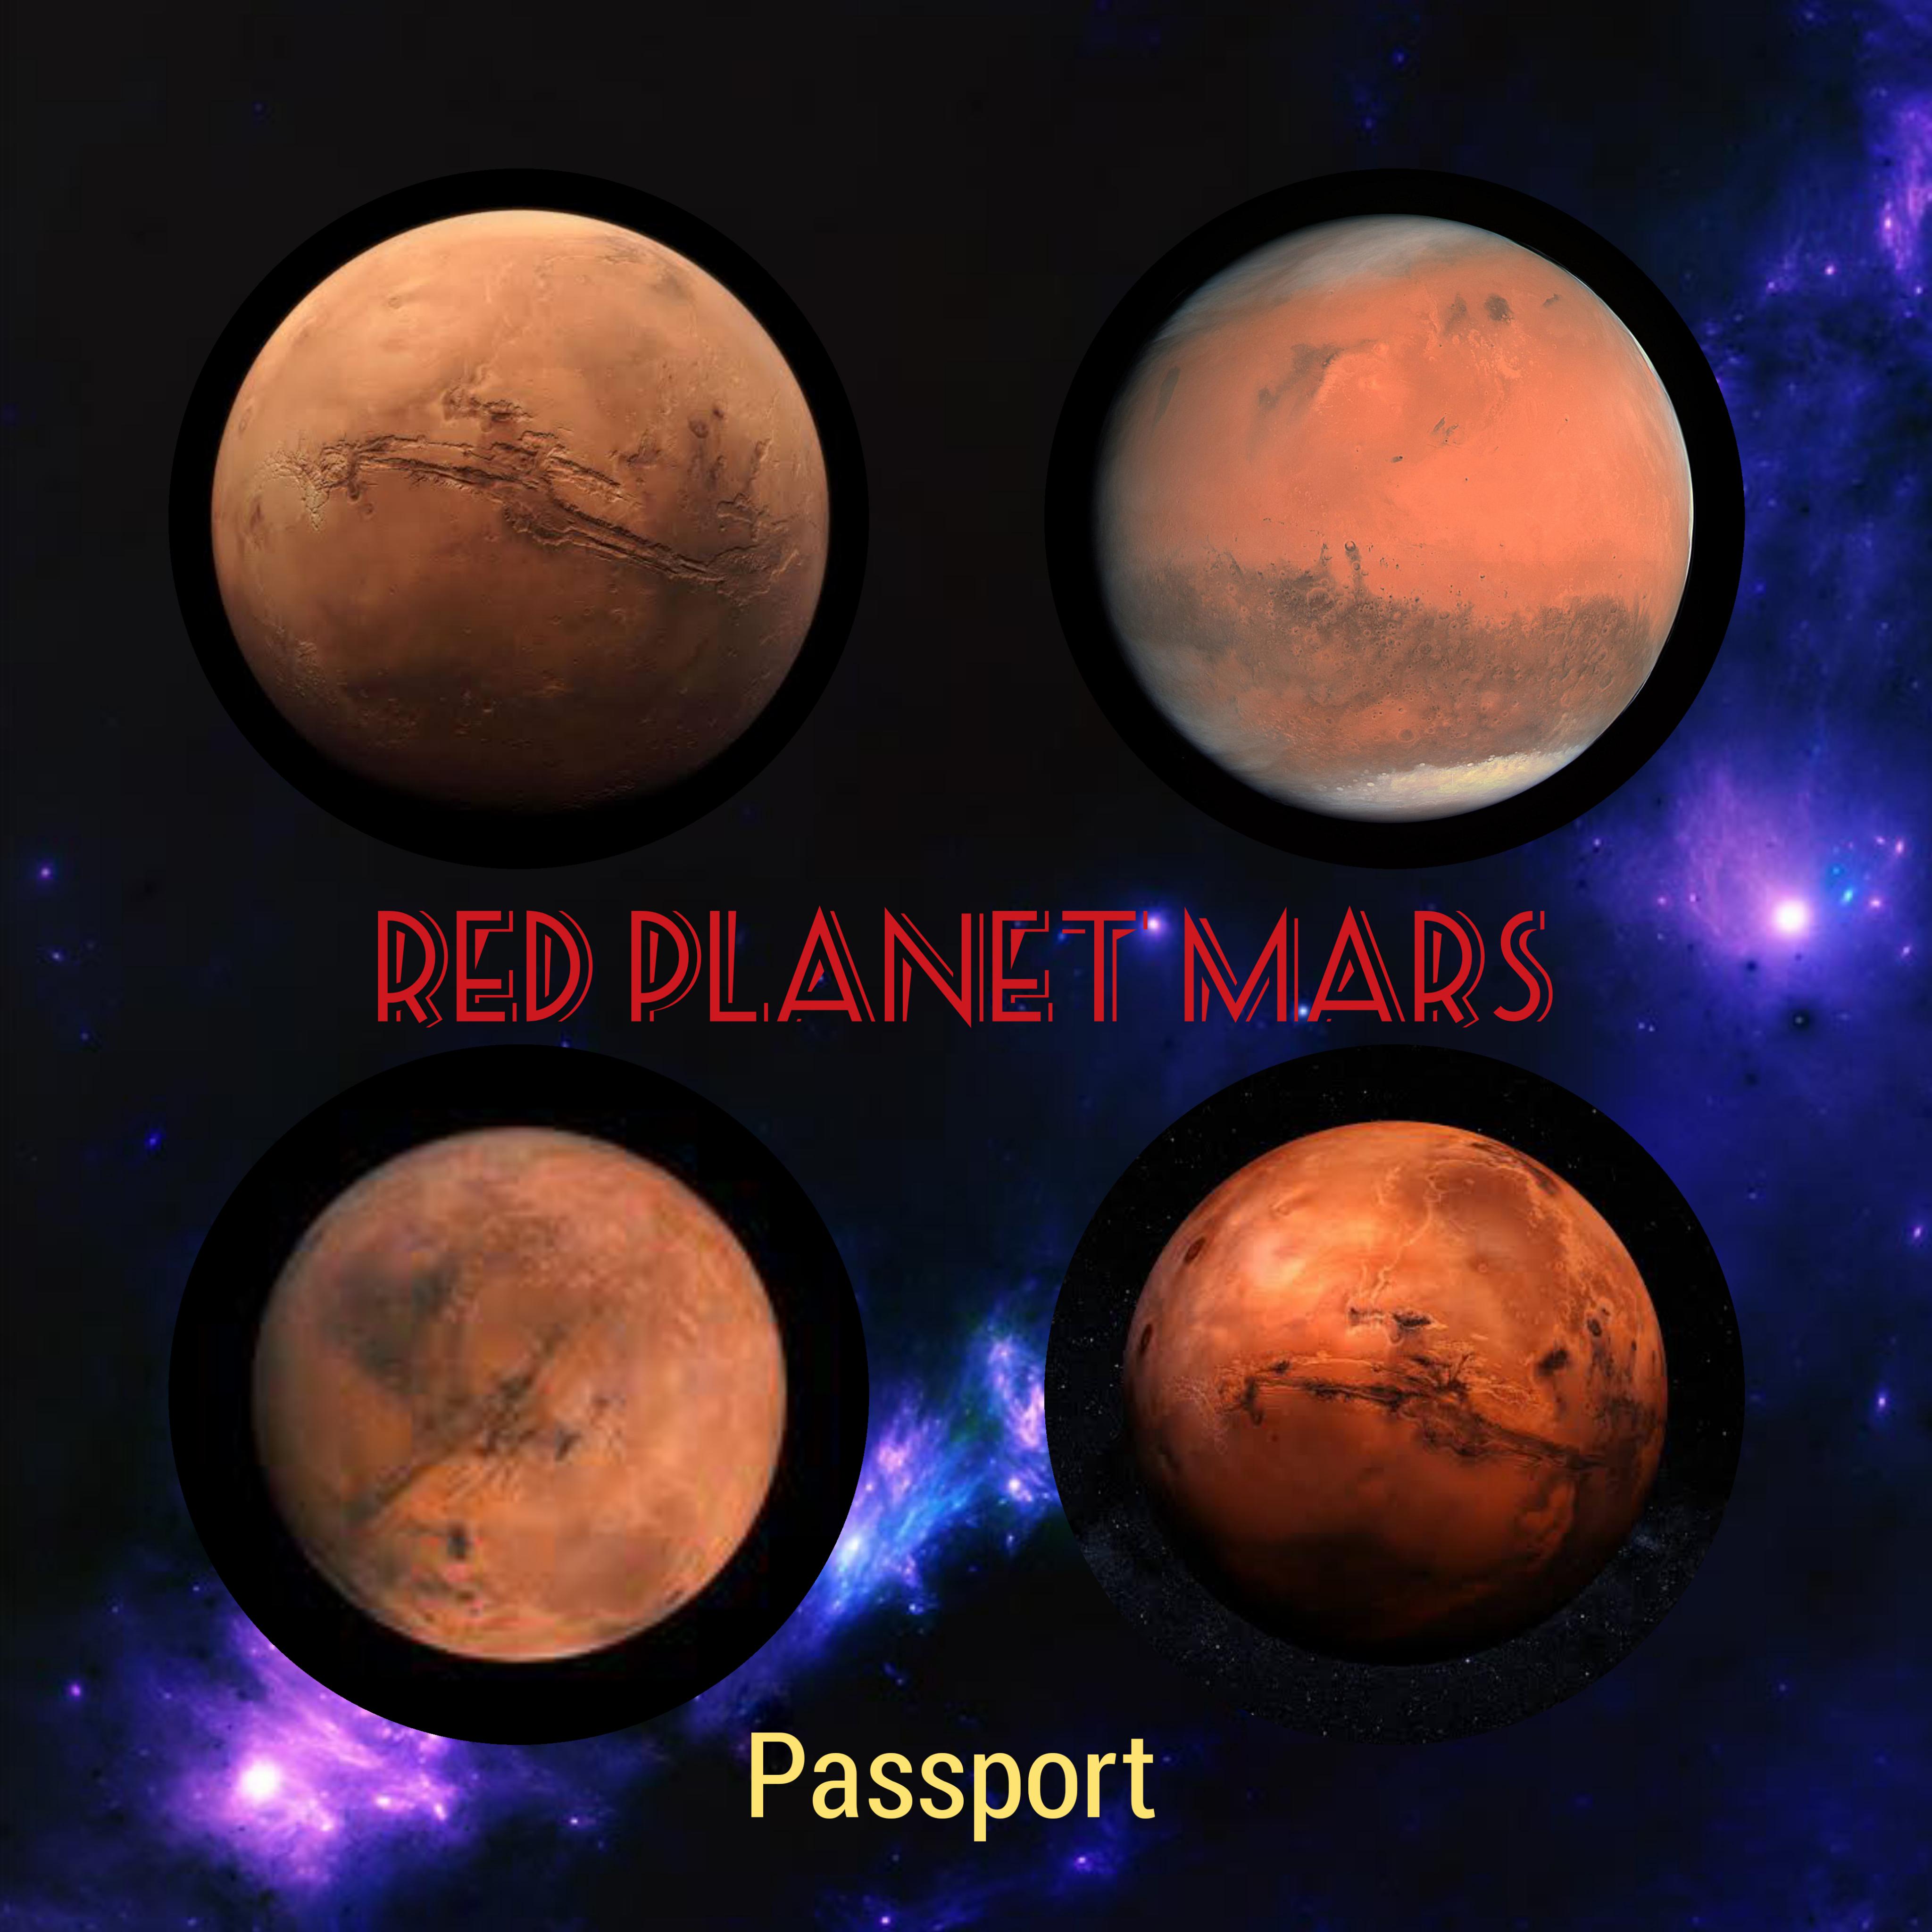 Red Planet Mars Passport - Meera Rajagop